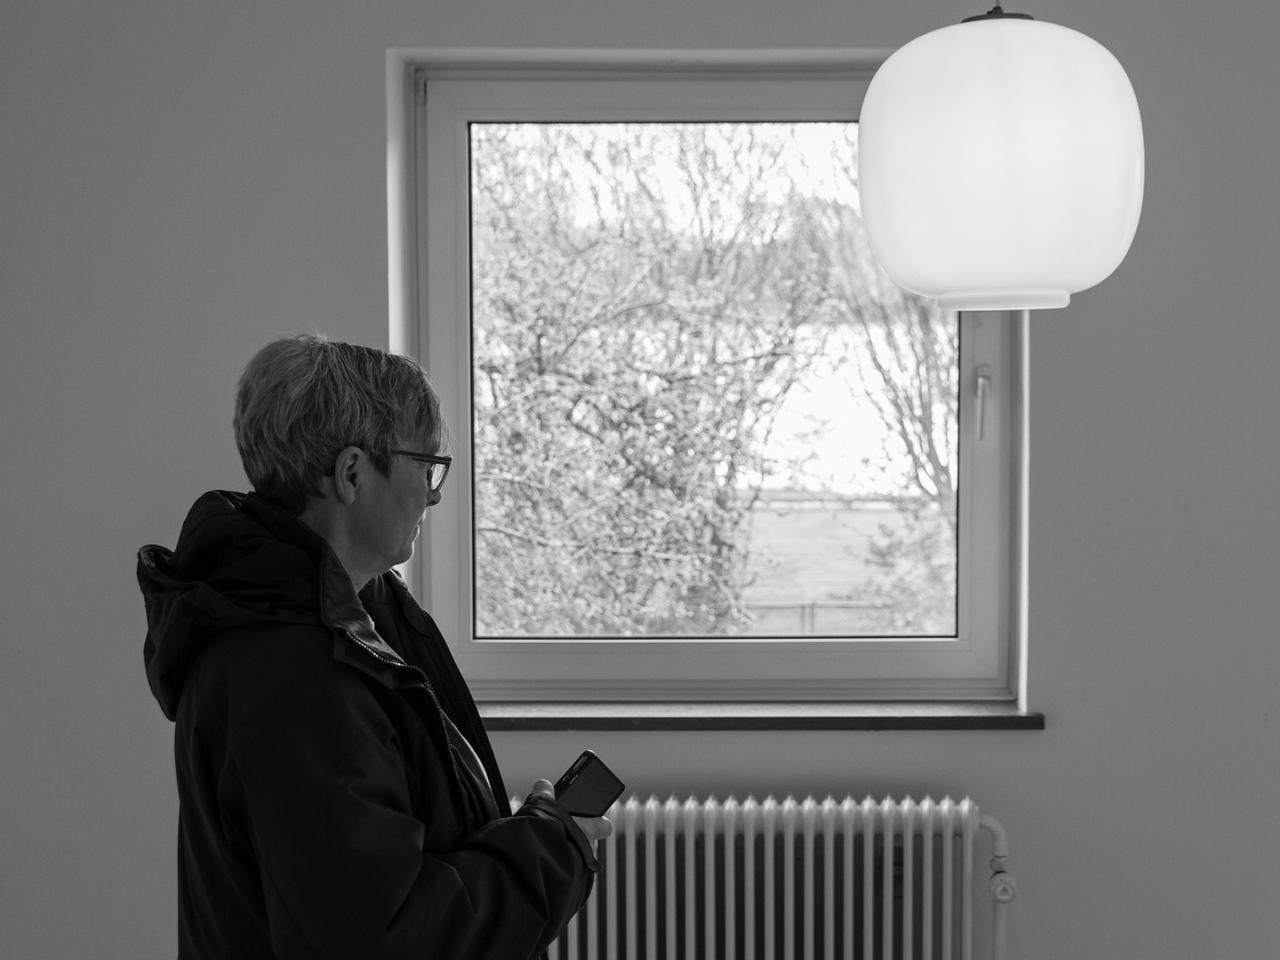 viborg_2014-04-17_0019